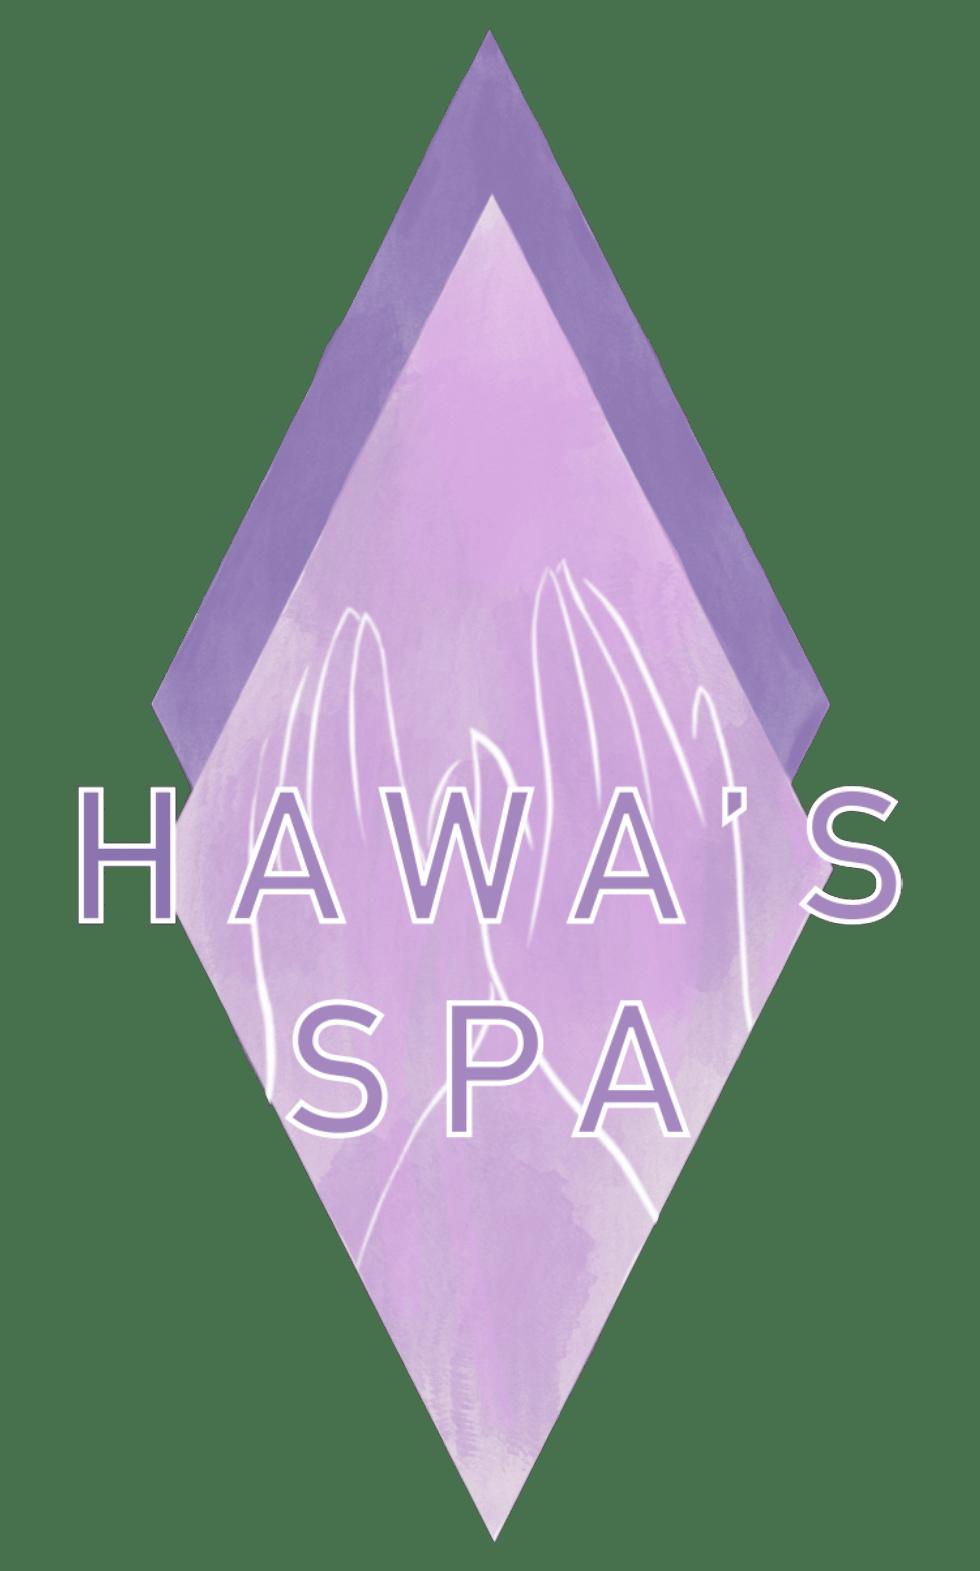 Hawa's Spa